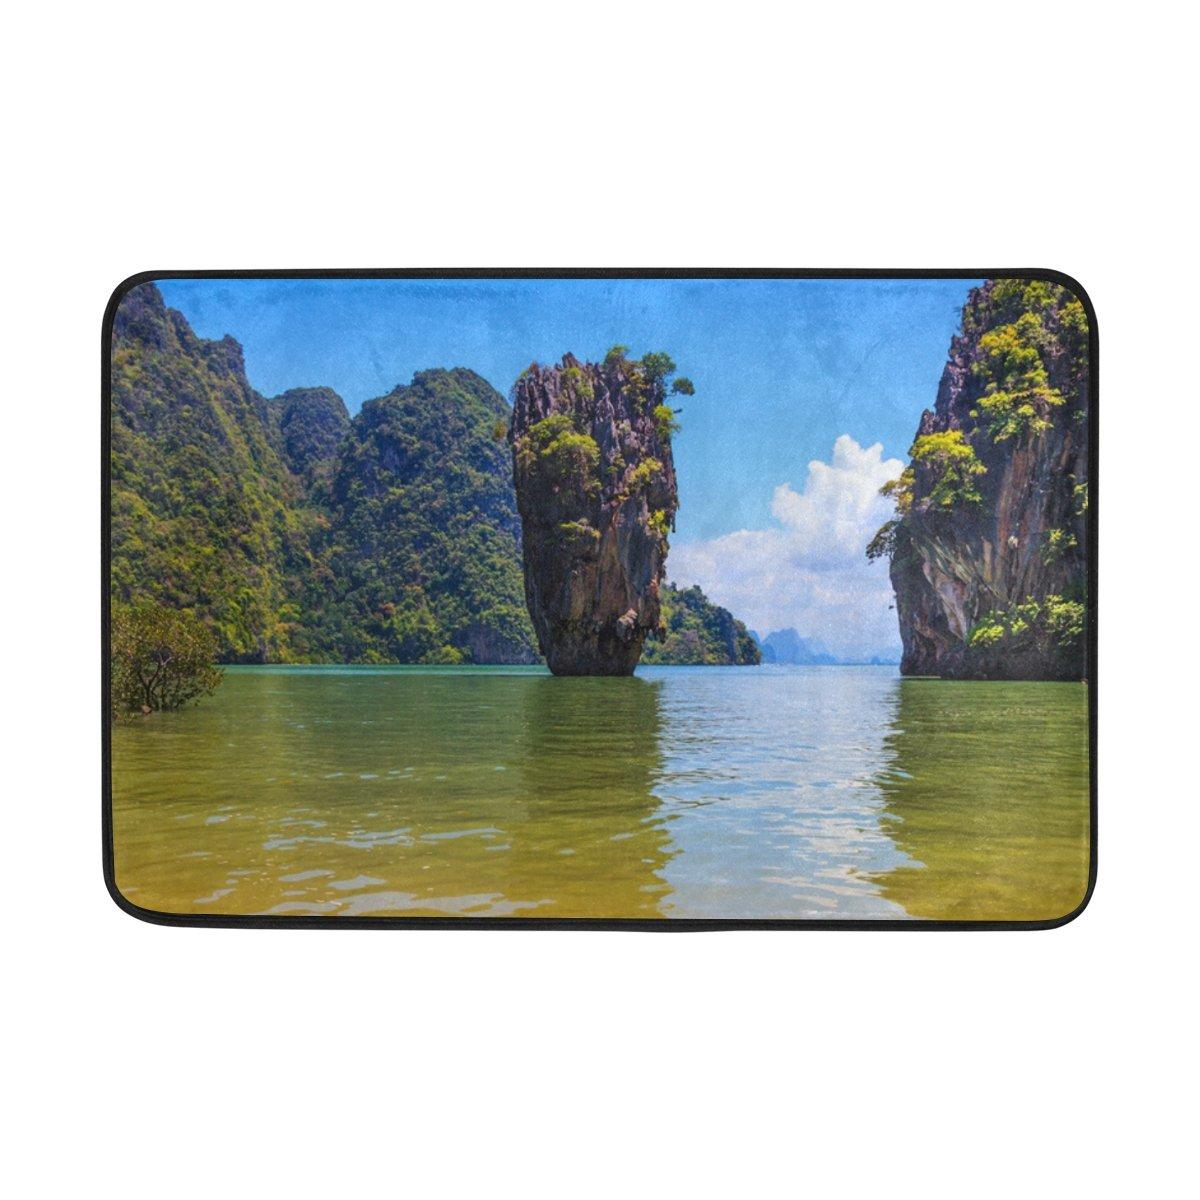 LEISISI Beautiful Thai Coast Fashion Design Indoor Outdoor Doormat 23.6(L) X15.7(W) inch Non-Slip doormat Home Decor